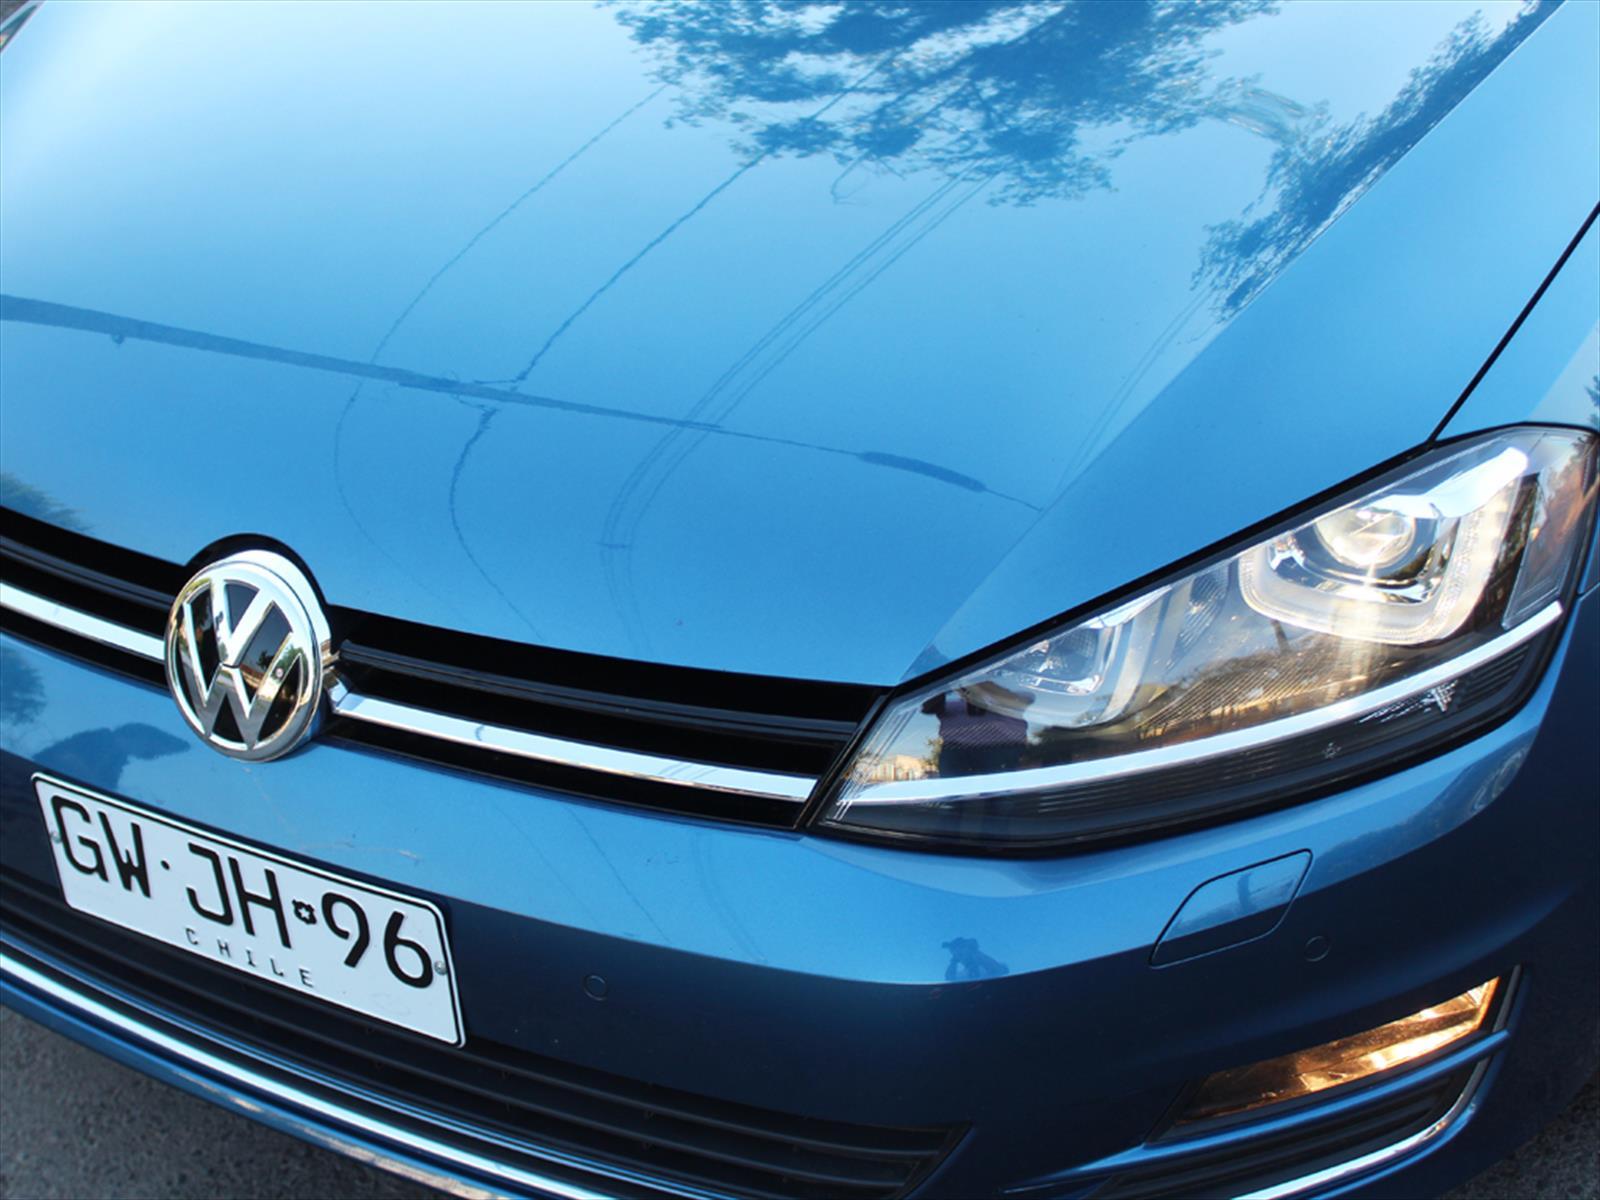 Prueba al Volkswagen Golf 1.4L TSI Turbo 2015: Sobresaliente